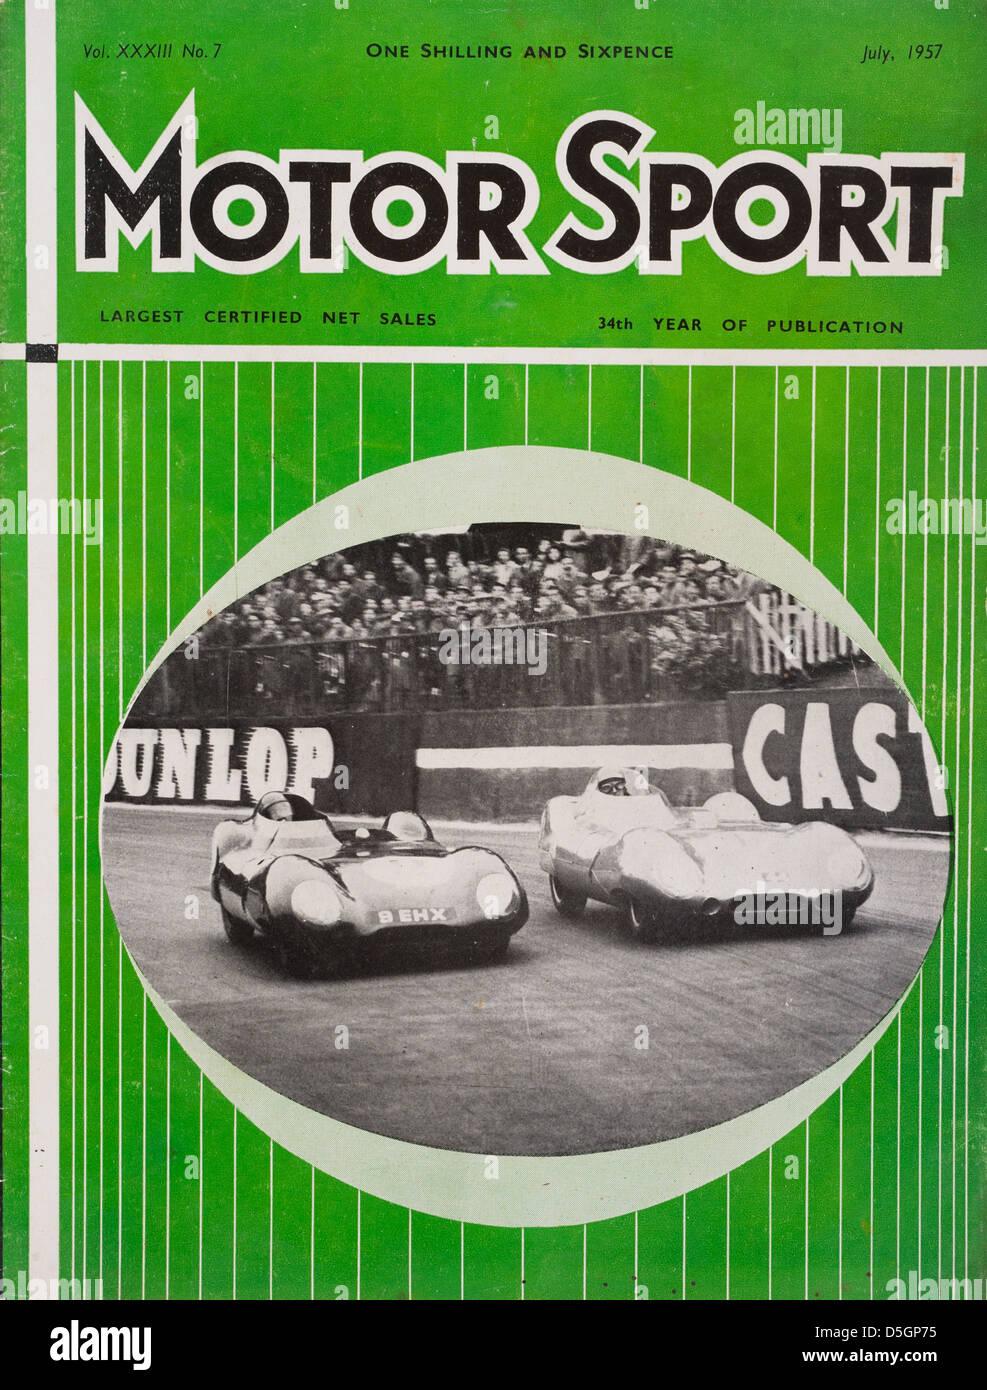 Motor Sport magazine n. 7, Vol XXXIII, Luglio 1957 Immagini Stock